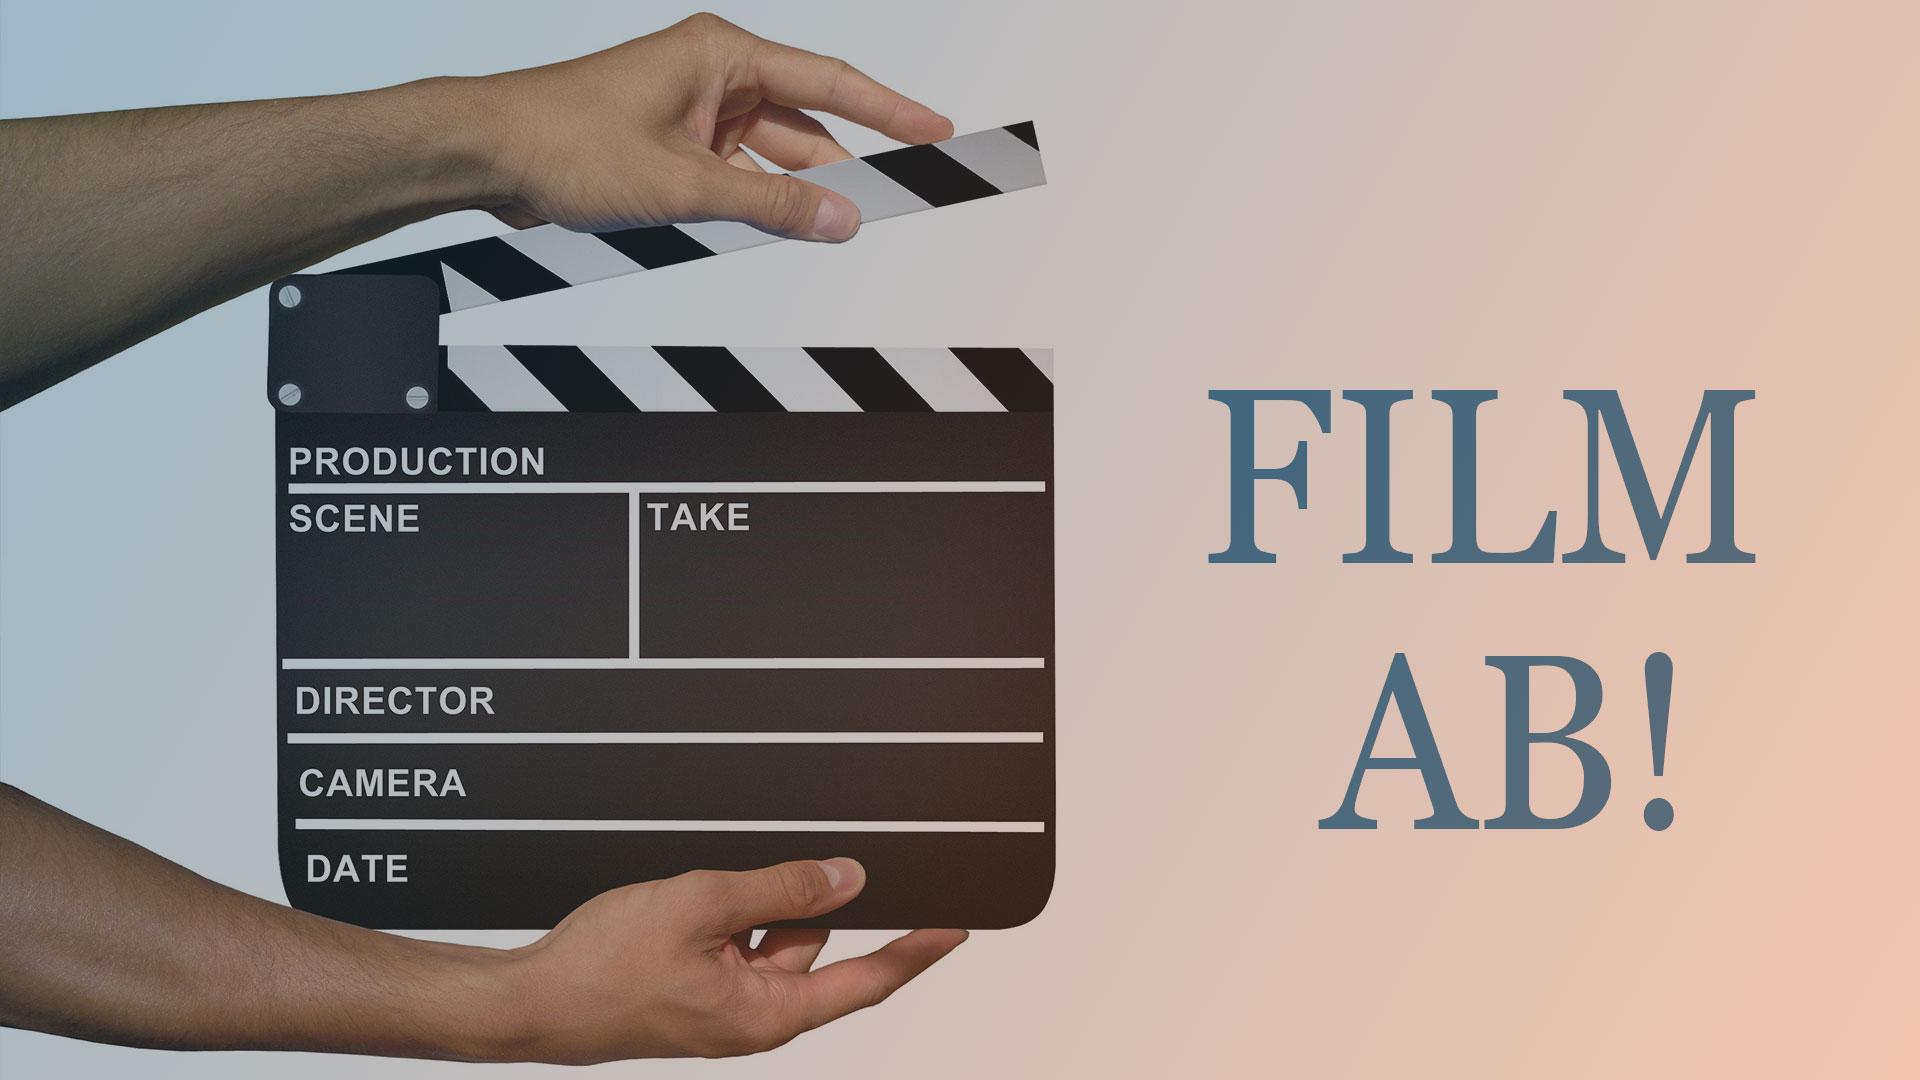 Filmklappe: Film ab!